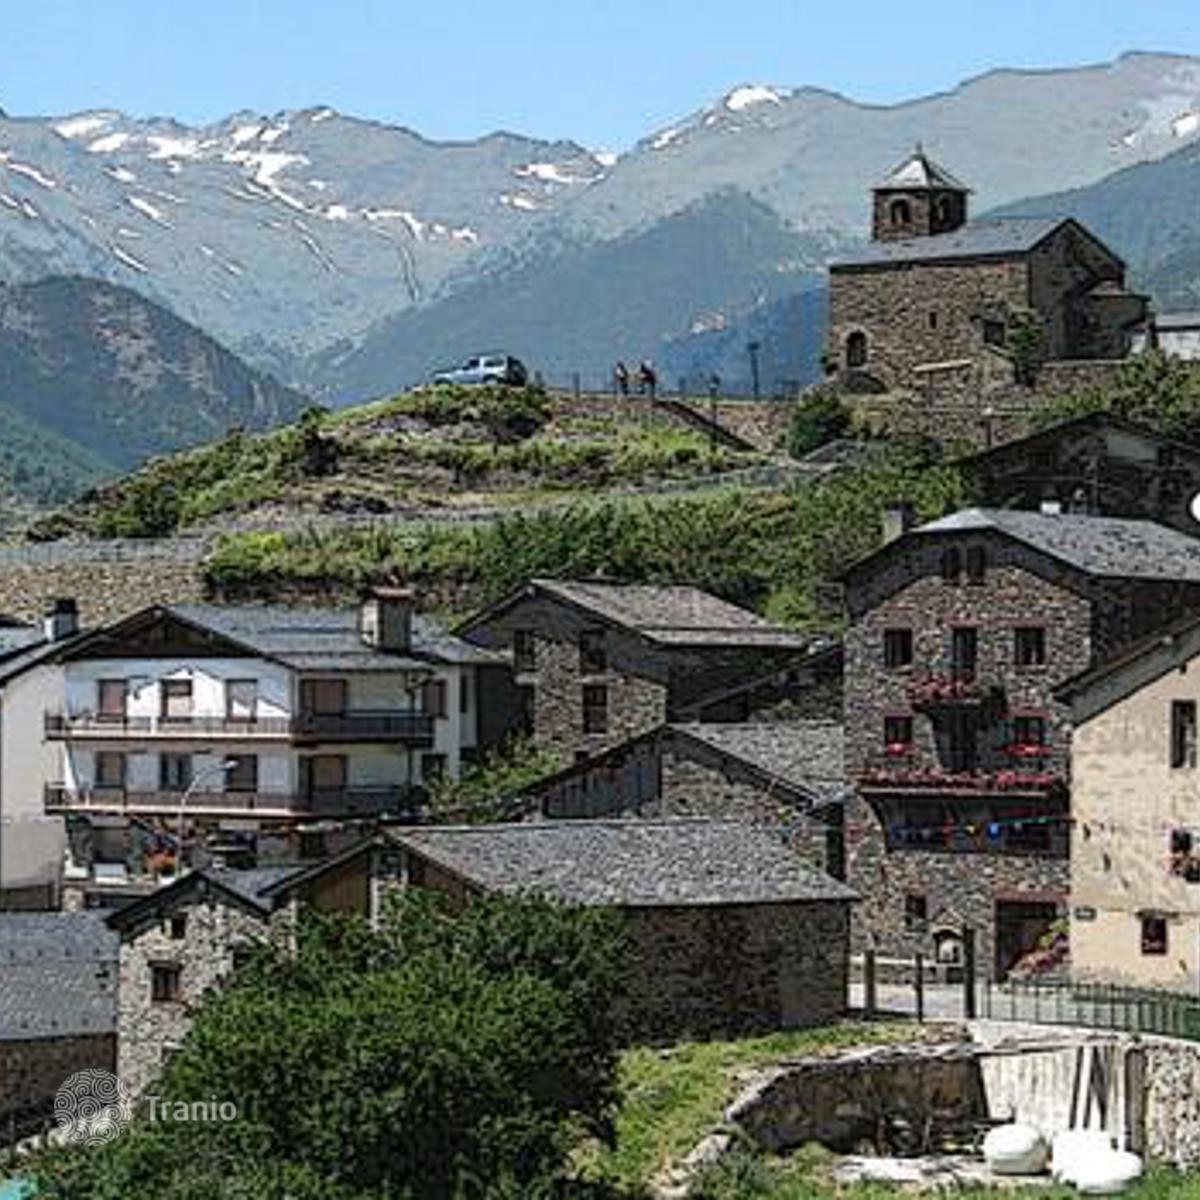 Listing #480513 In Anyós, La Massana, Andorra